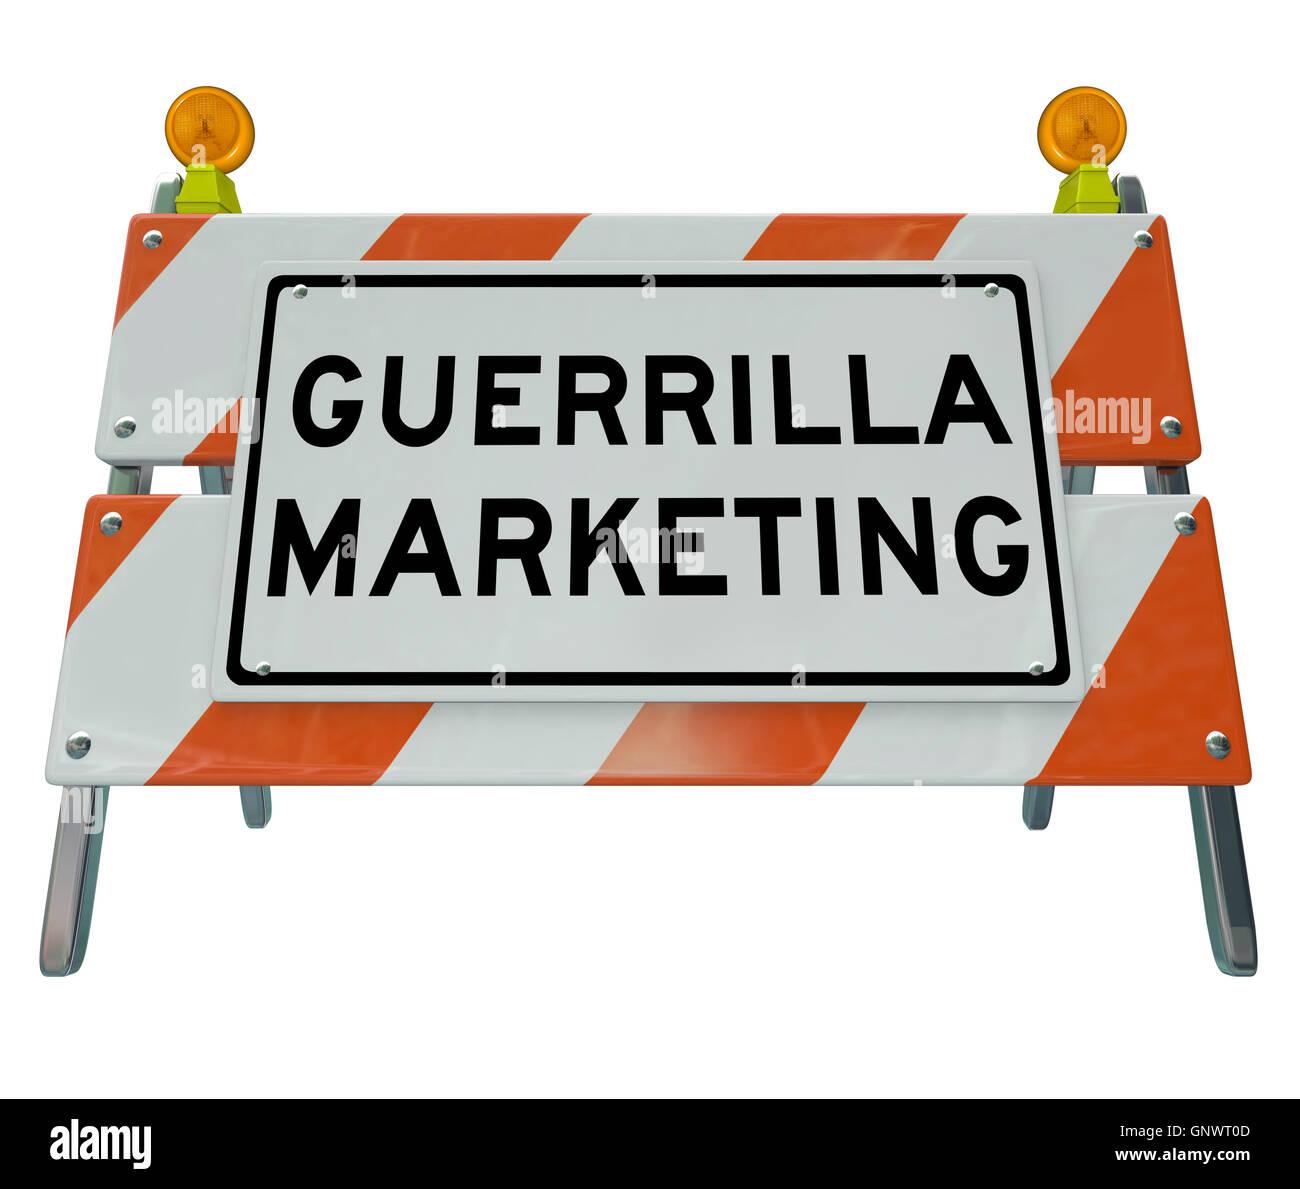 Guerrilla Marketing Sign Barrier Barricade Words - Stock Image